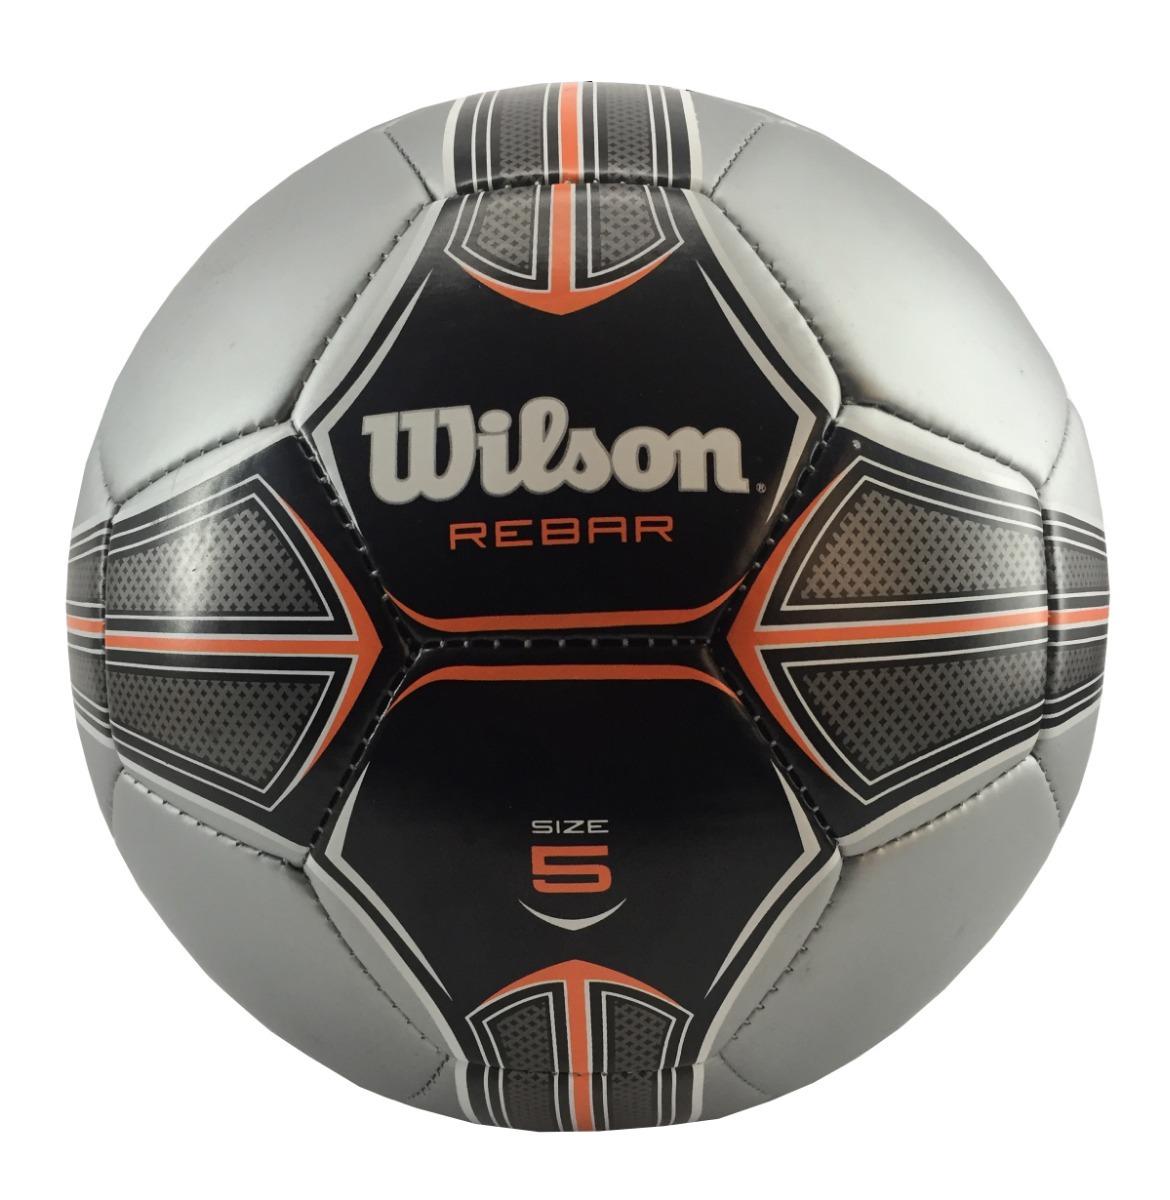 387cf0da02 Bola Futebol Wilson Rebar 5 - Prata E Laranja - R  59